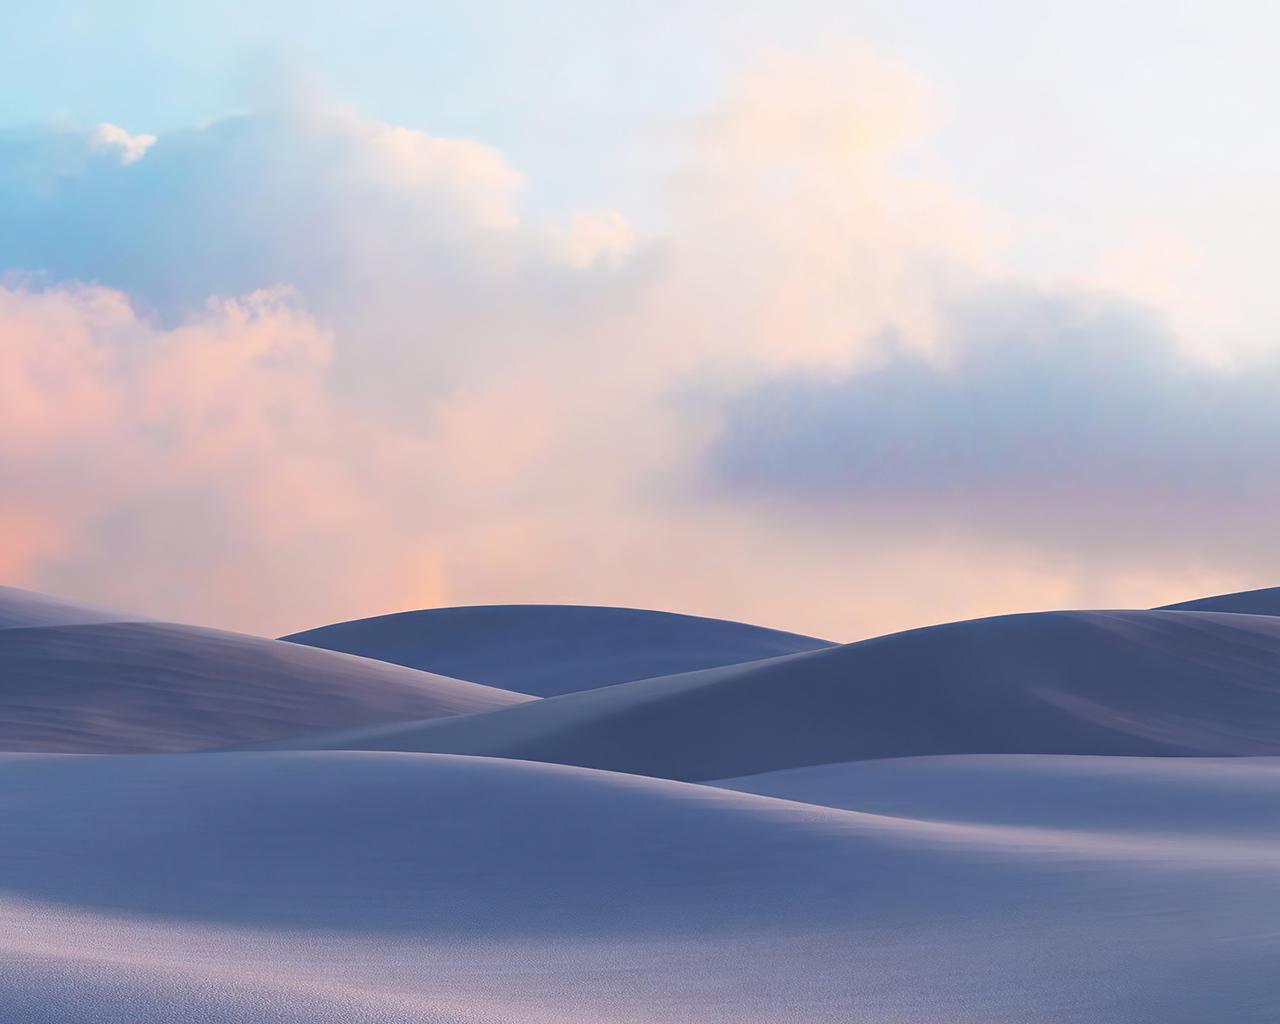 microsoft-surface-sand-dunes-4k-8y.jpg